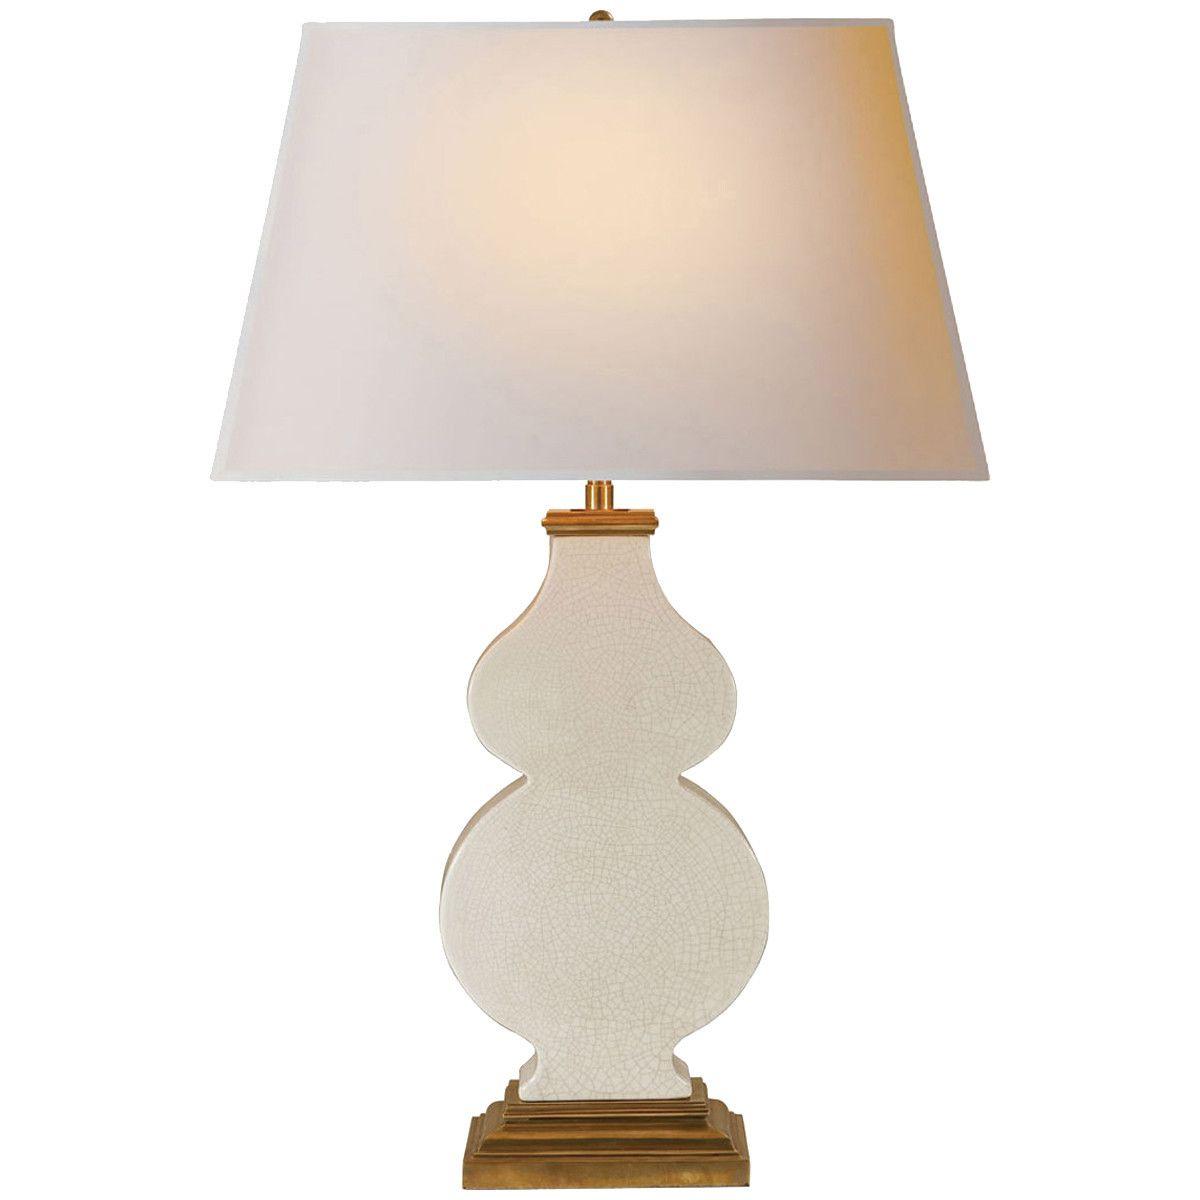 Visual Comfort Lighting Alexa Hampton Anita 1 Light Table Lamp Decorative Table Lamps Table Lamp Lamp